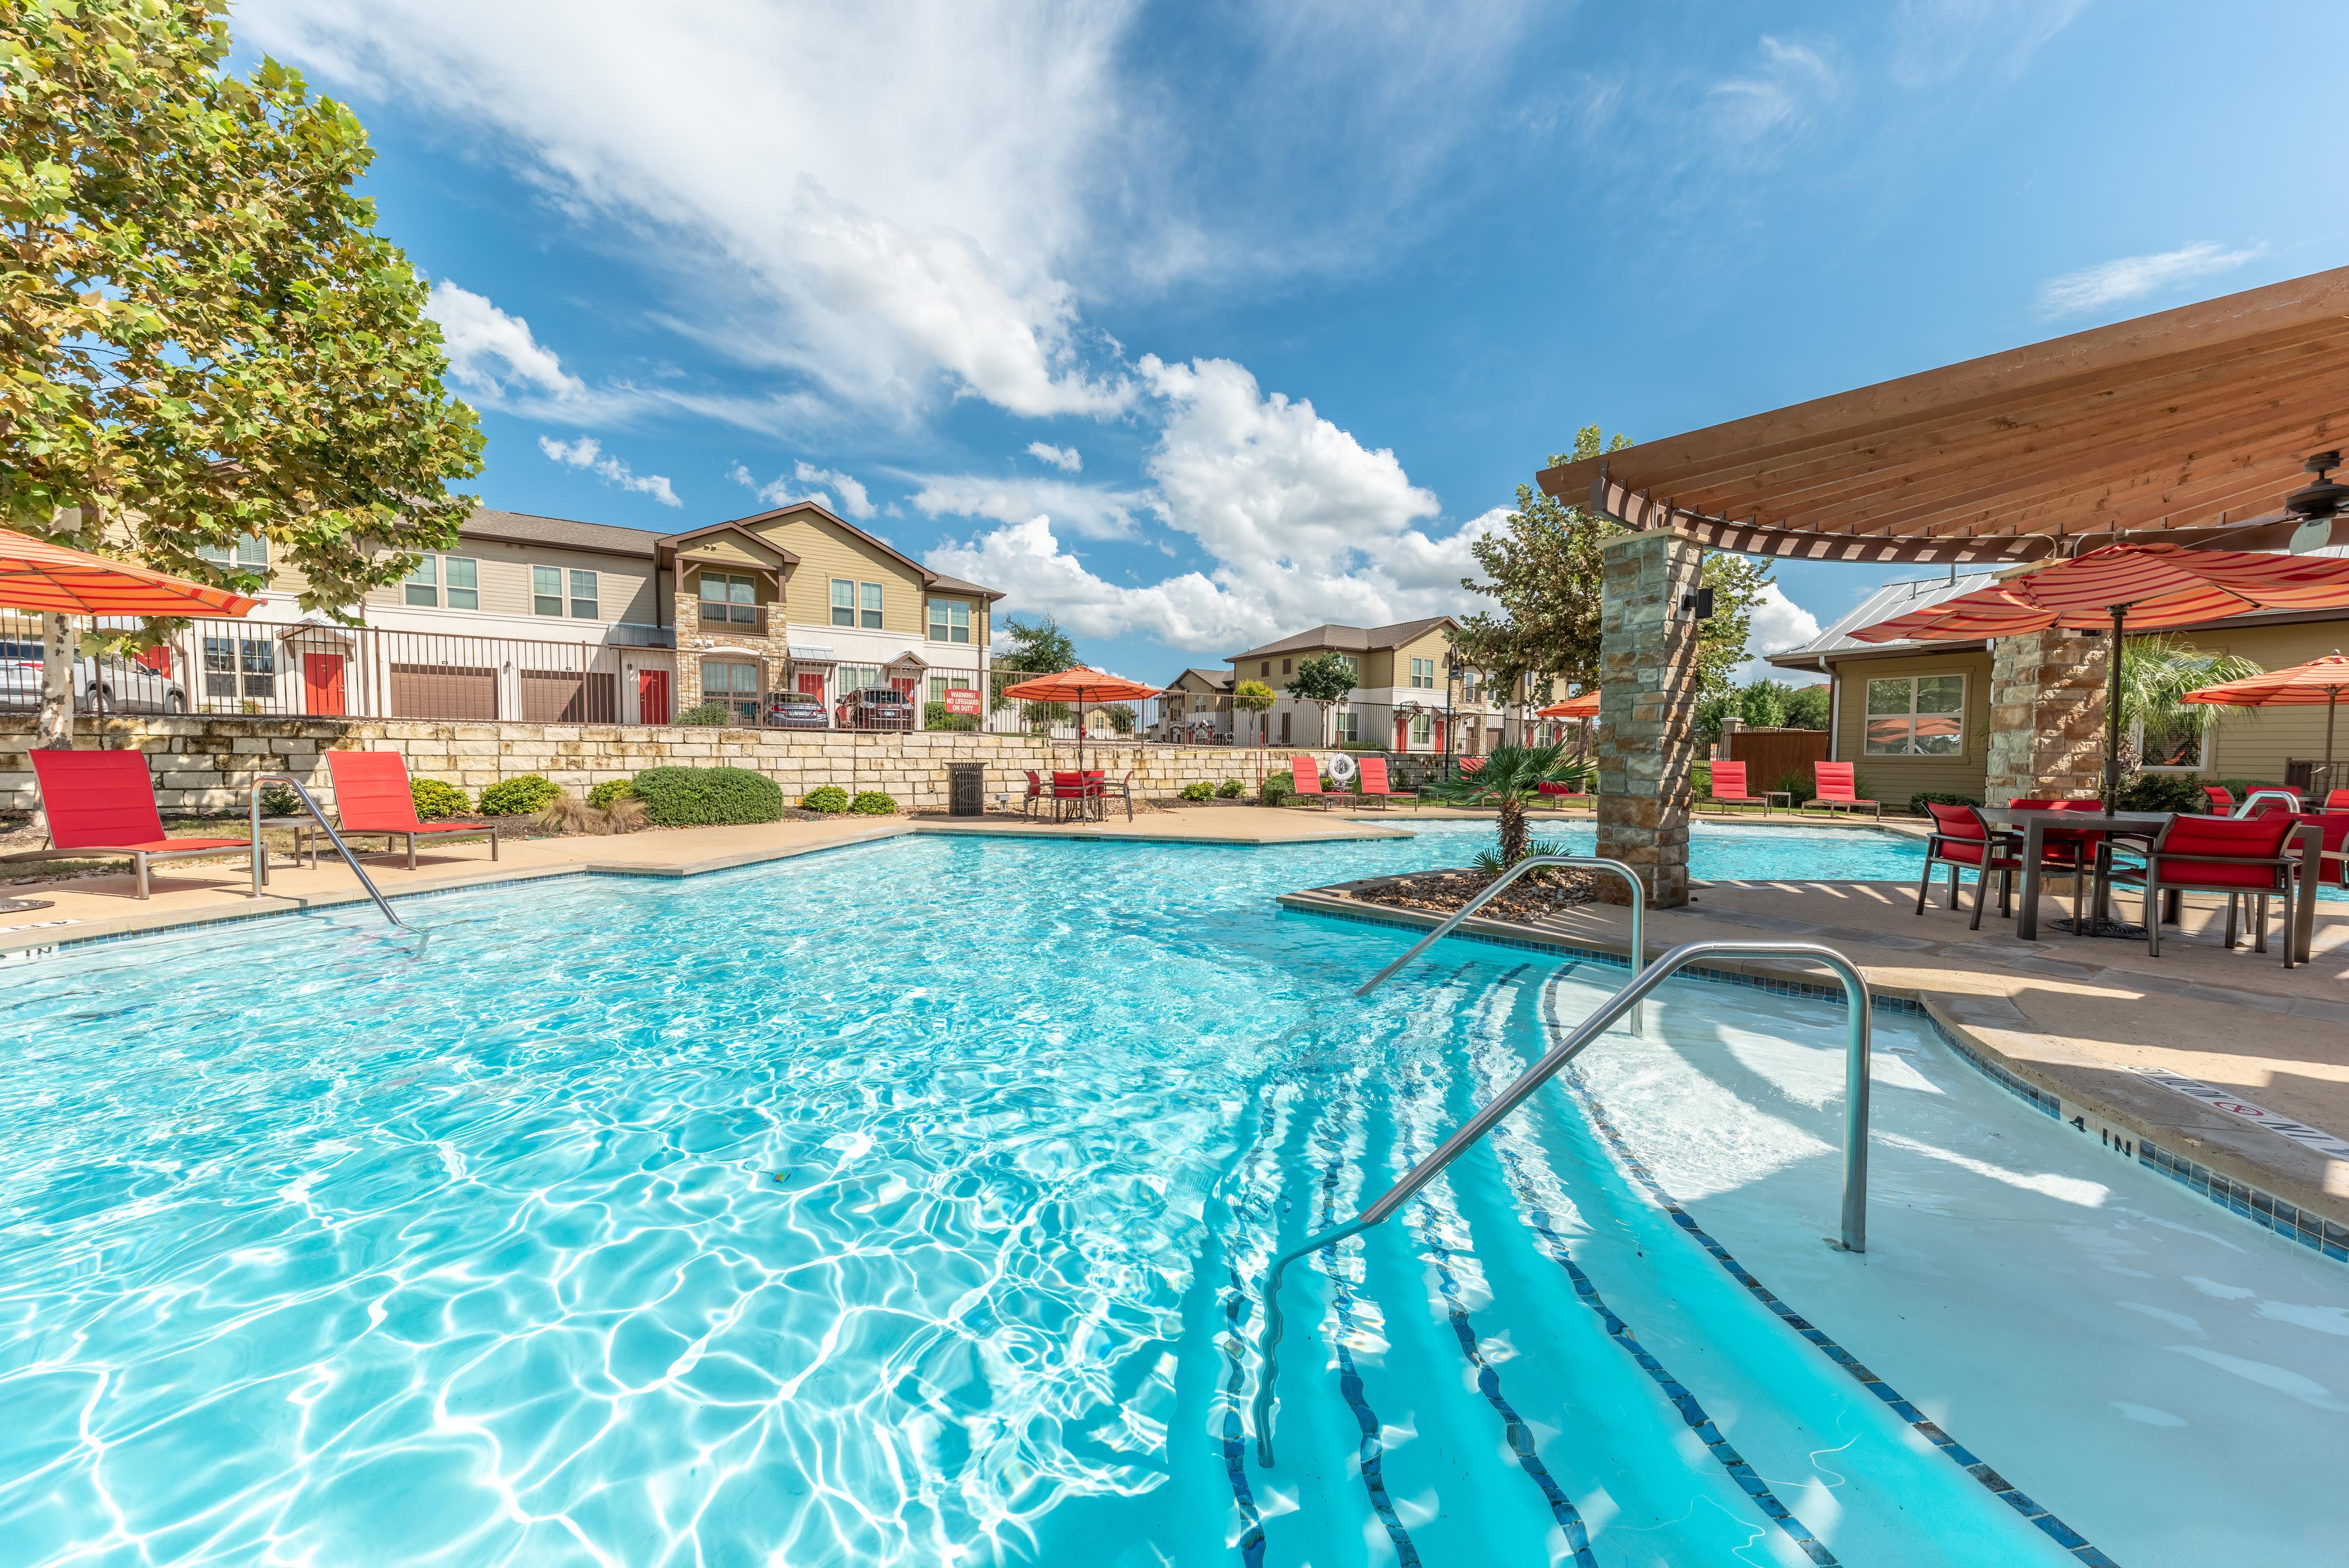 Outdoor pool at Firewheel Apartments in San Antonio